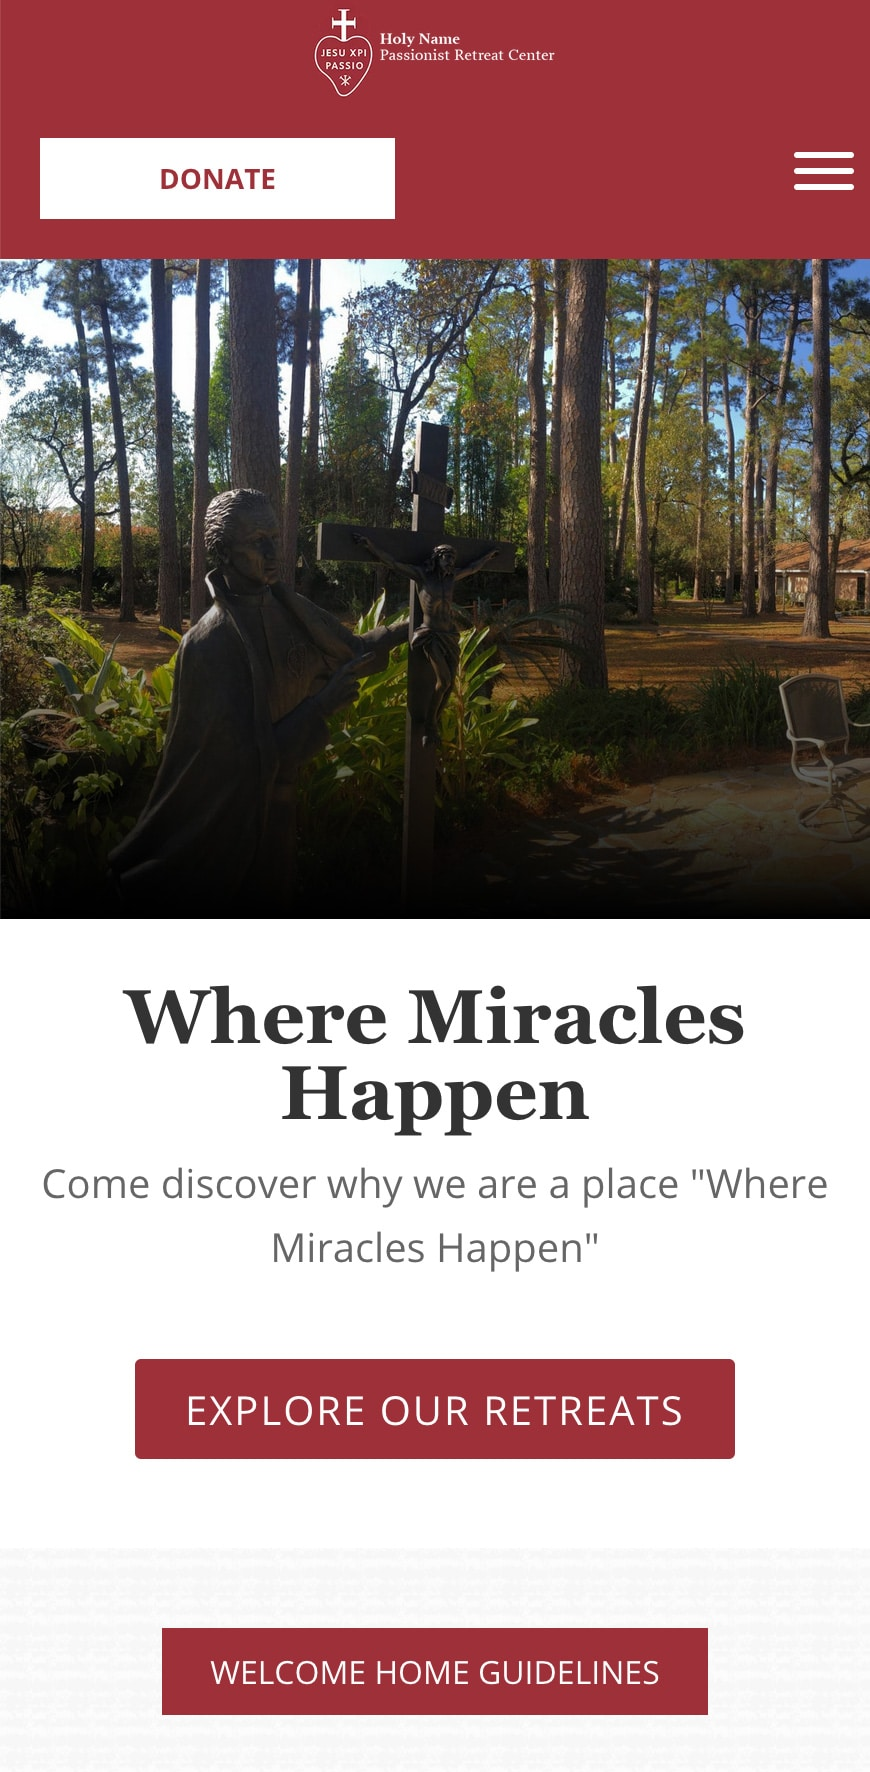 HNPRC Homepage Mobile 1